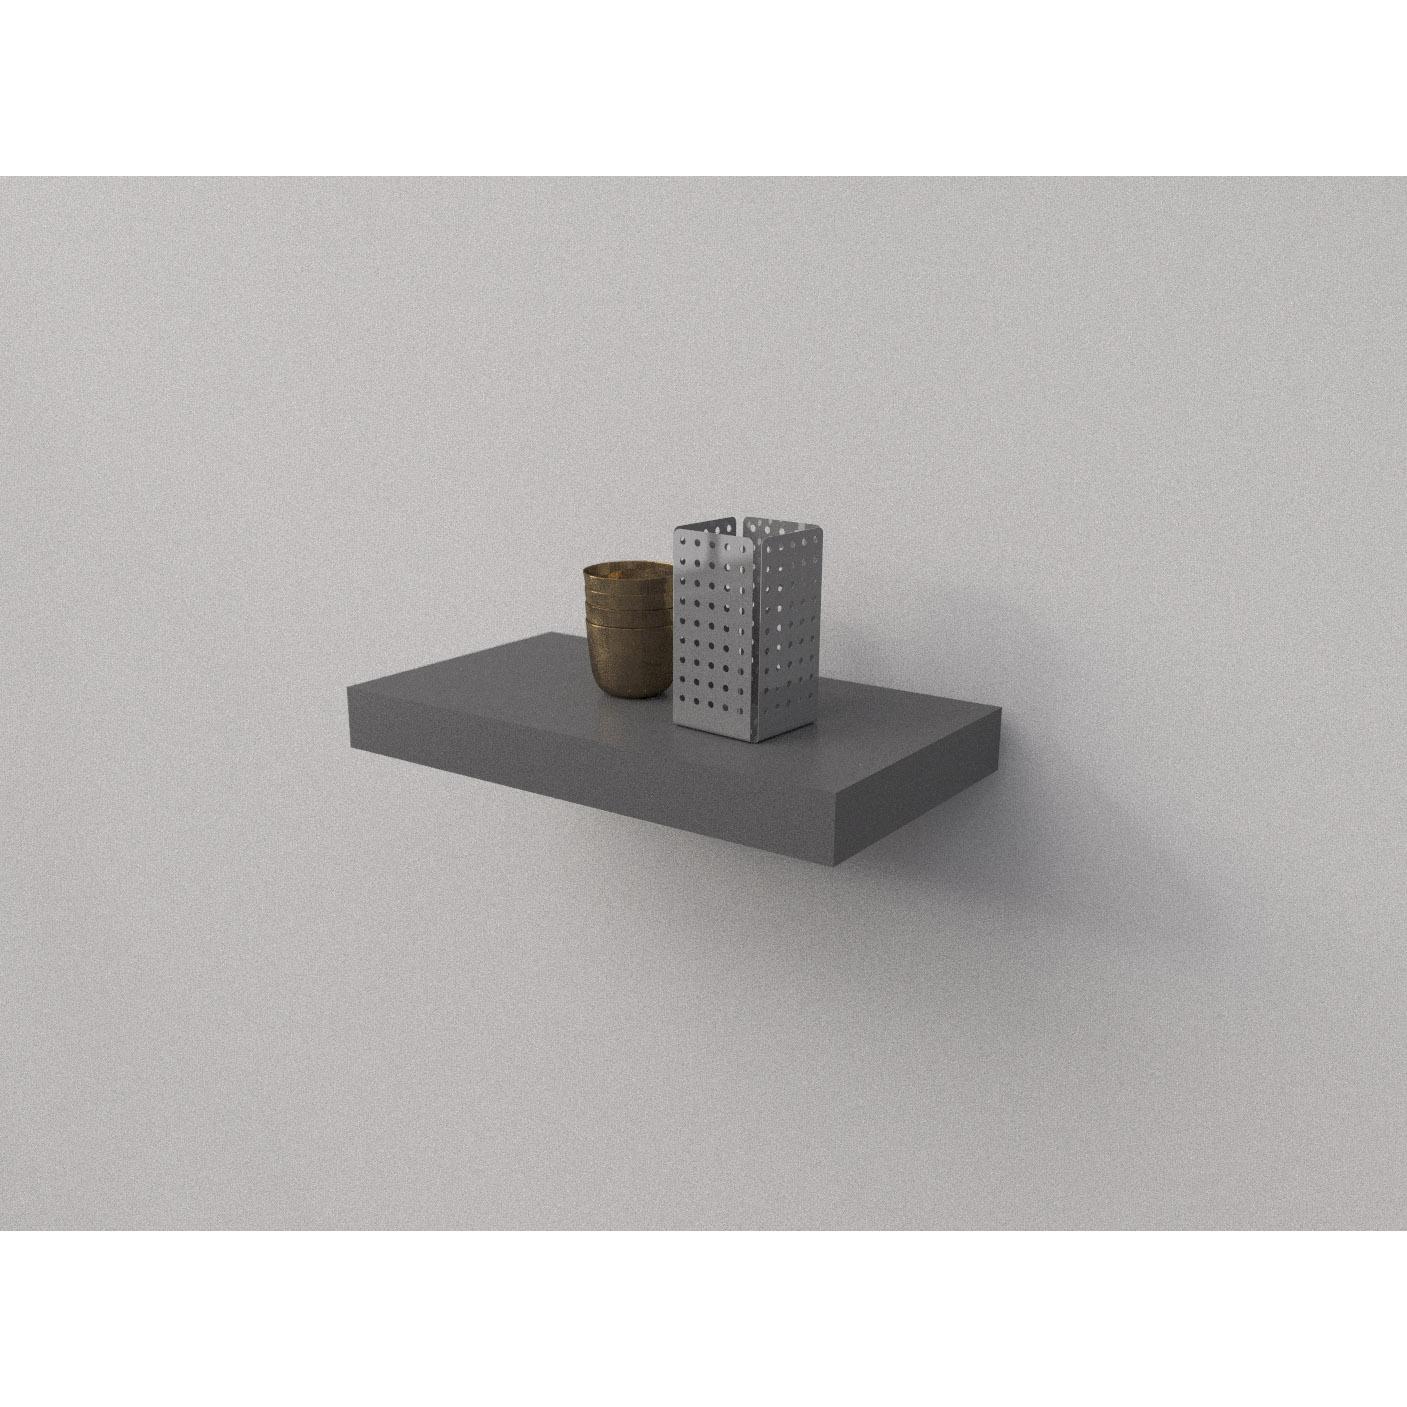 dark grey floating shelf kit mastershelf stone part with drawer storage tree bench small metal rack couch table ikea dvd player and sky box shelving kmart porirua peel stick wall